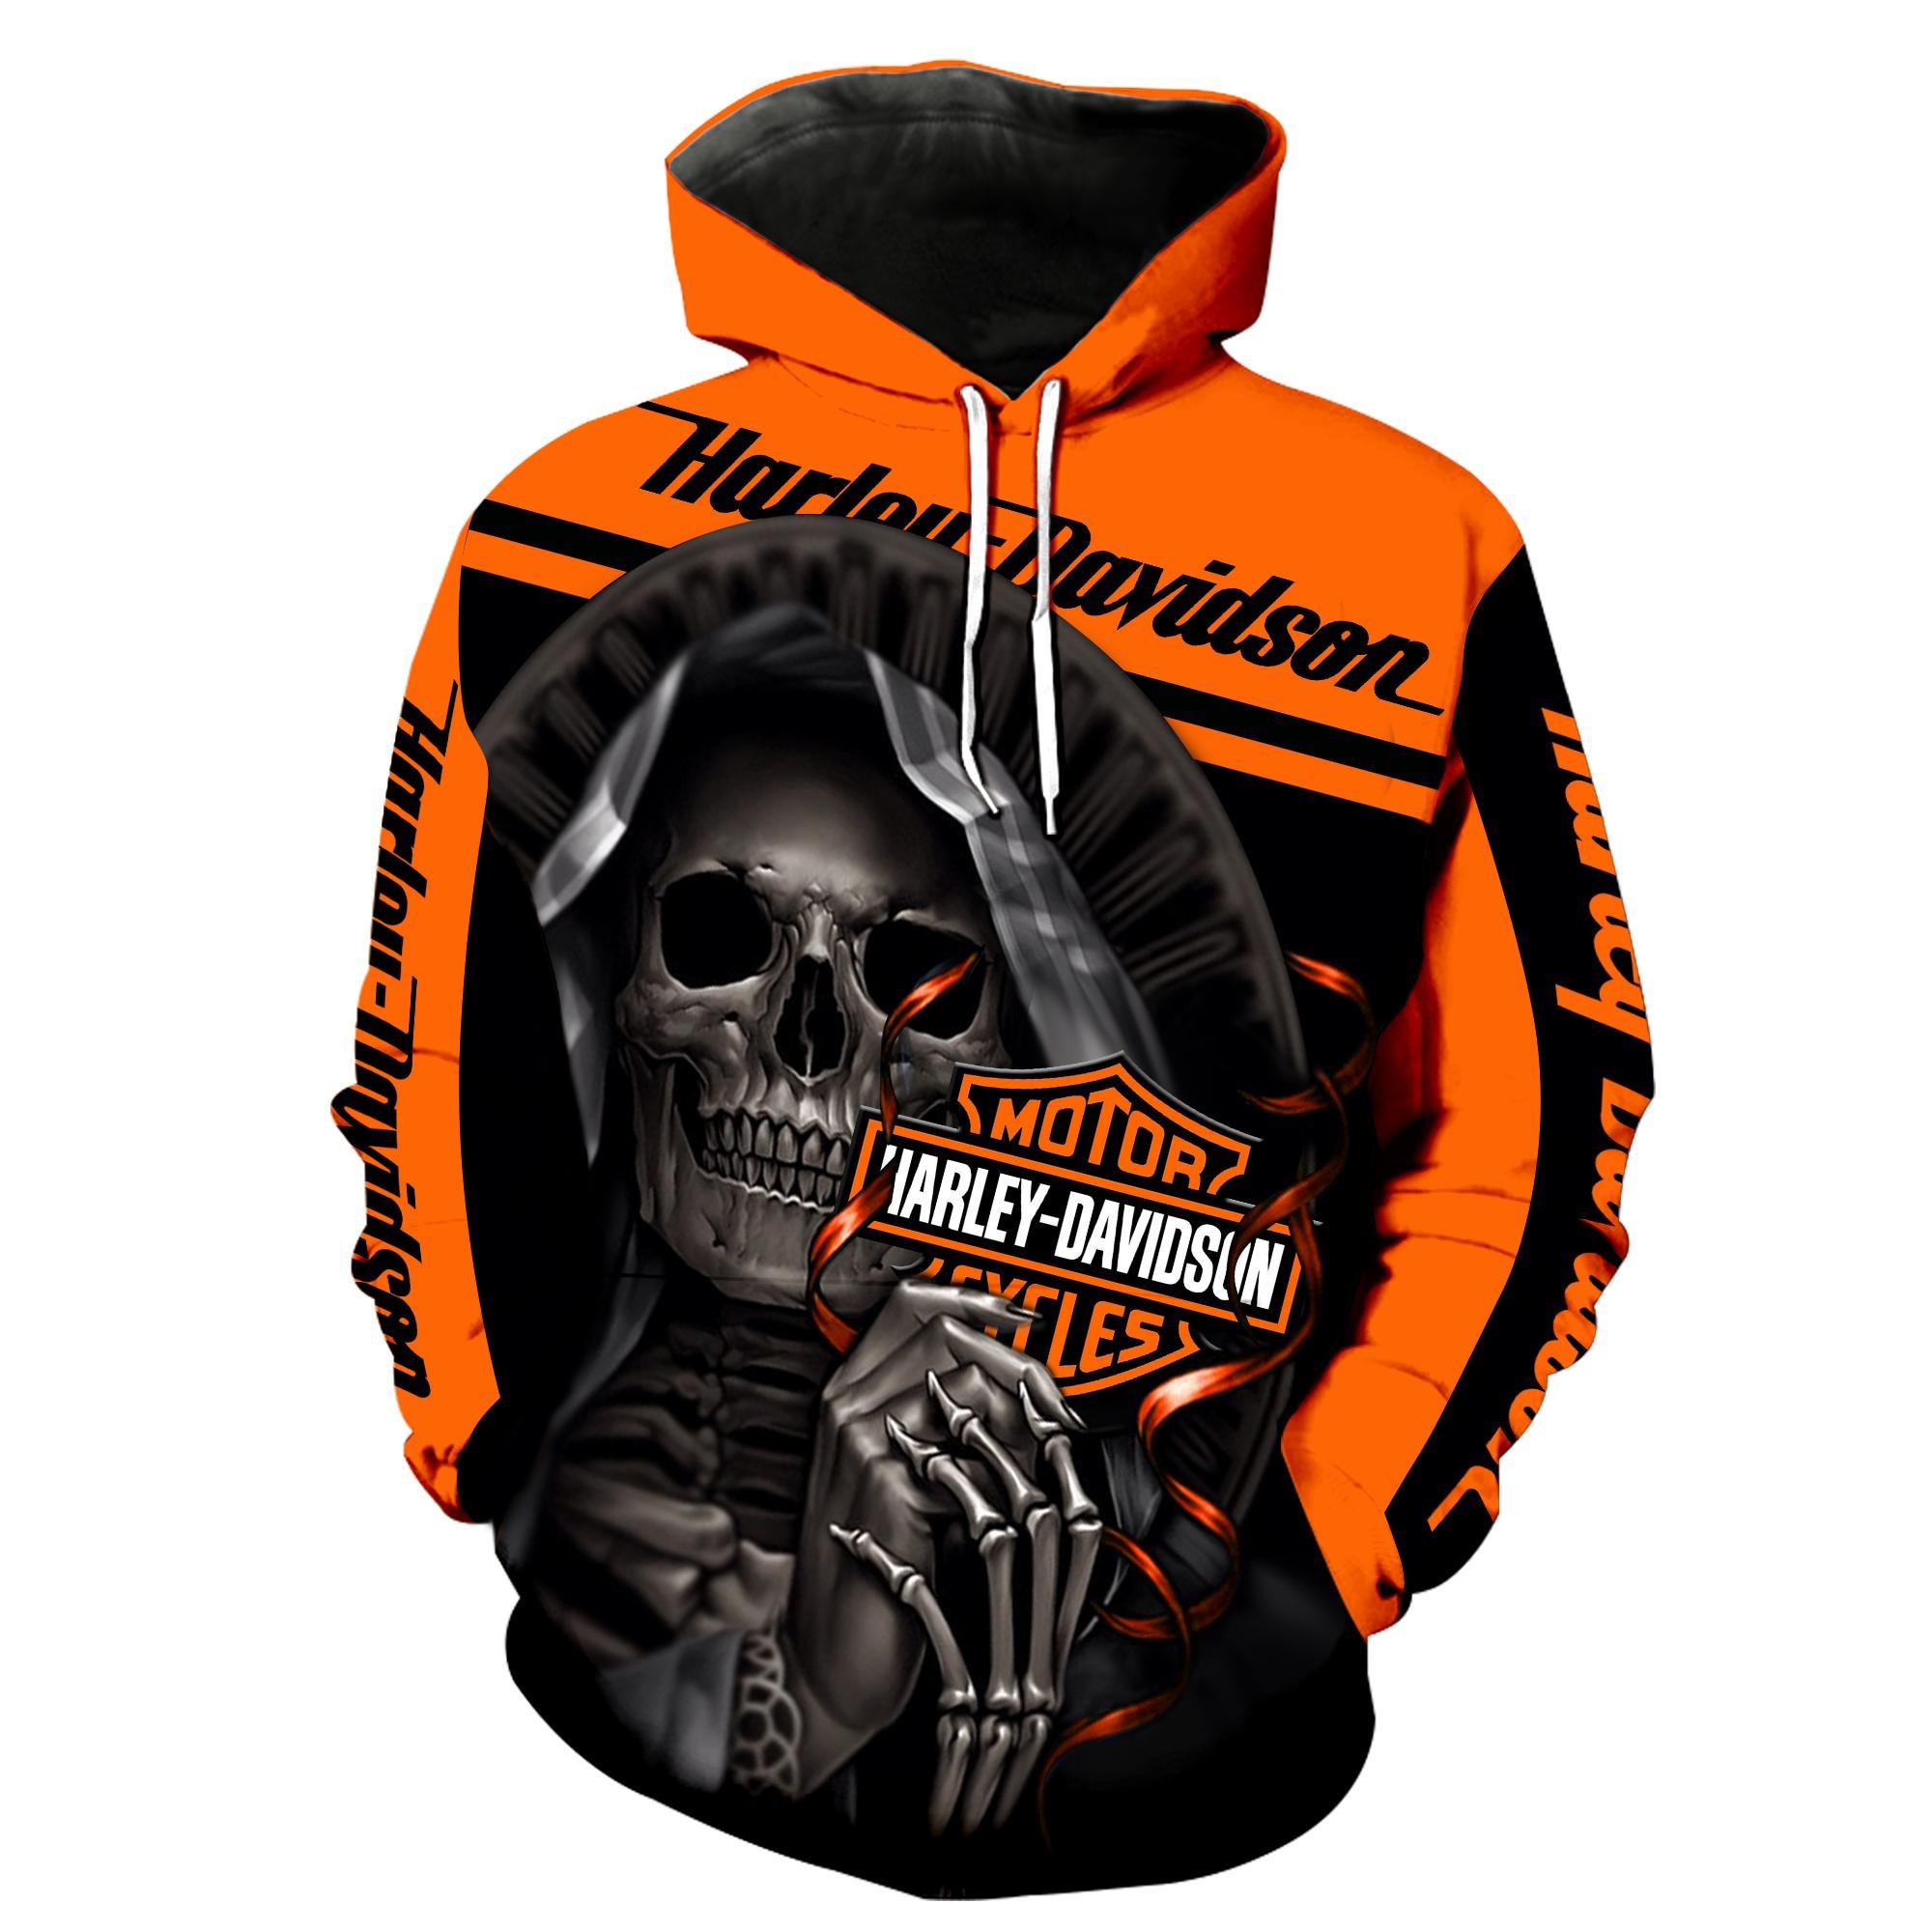 Harley-Davidson Motorcycle Skull 3D Full Over Print shirt hoodie